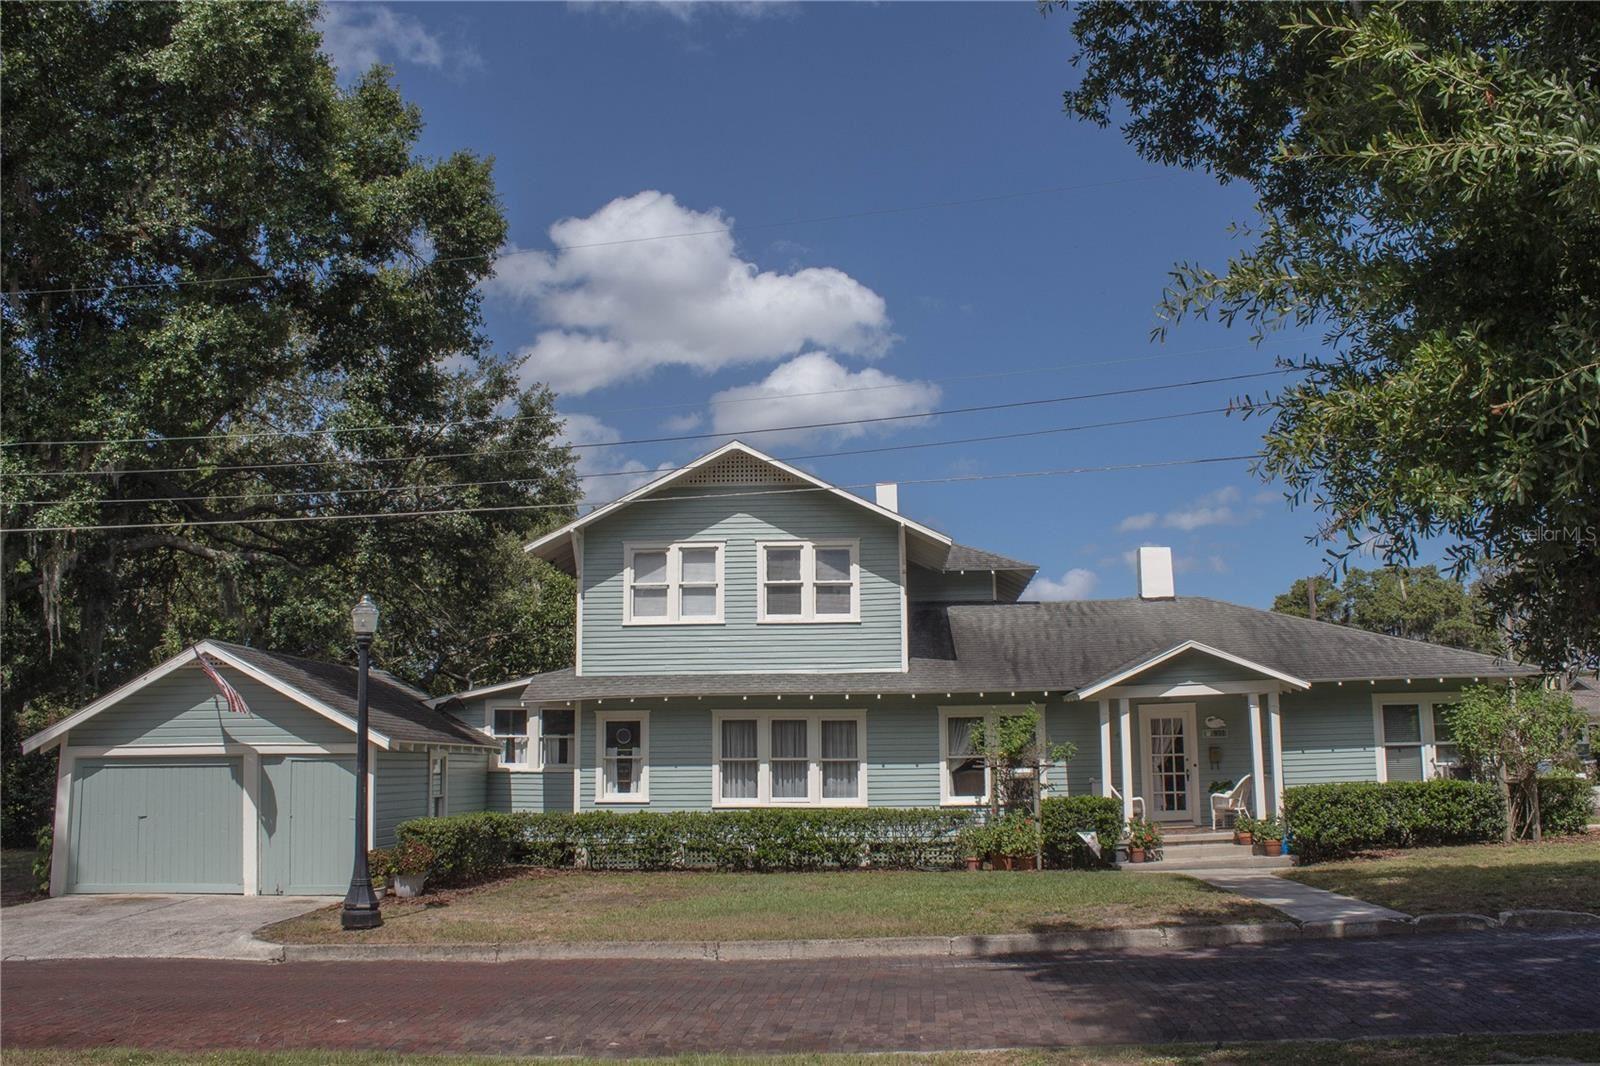 931 MISSISSIPPI AVENUE, Lakeland, FL 33803 - #: L4922907